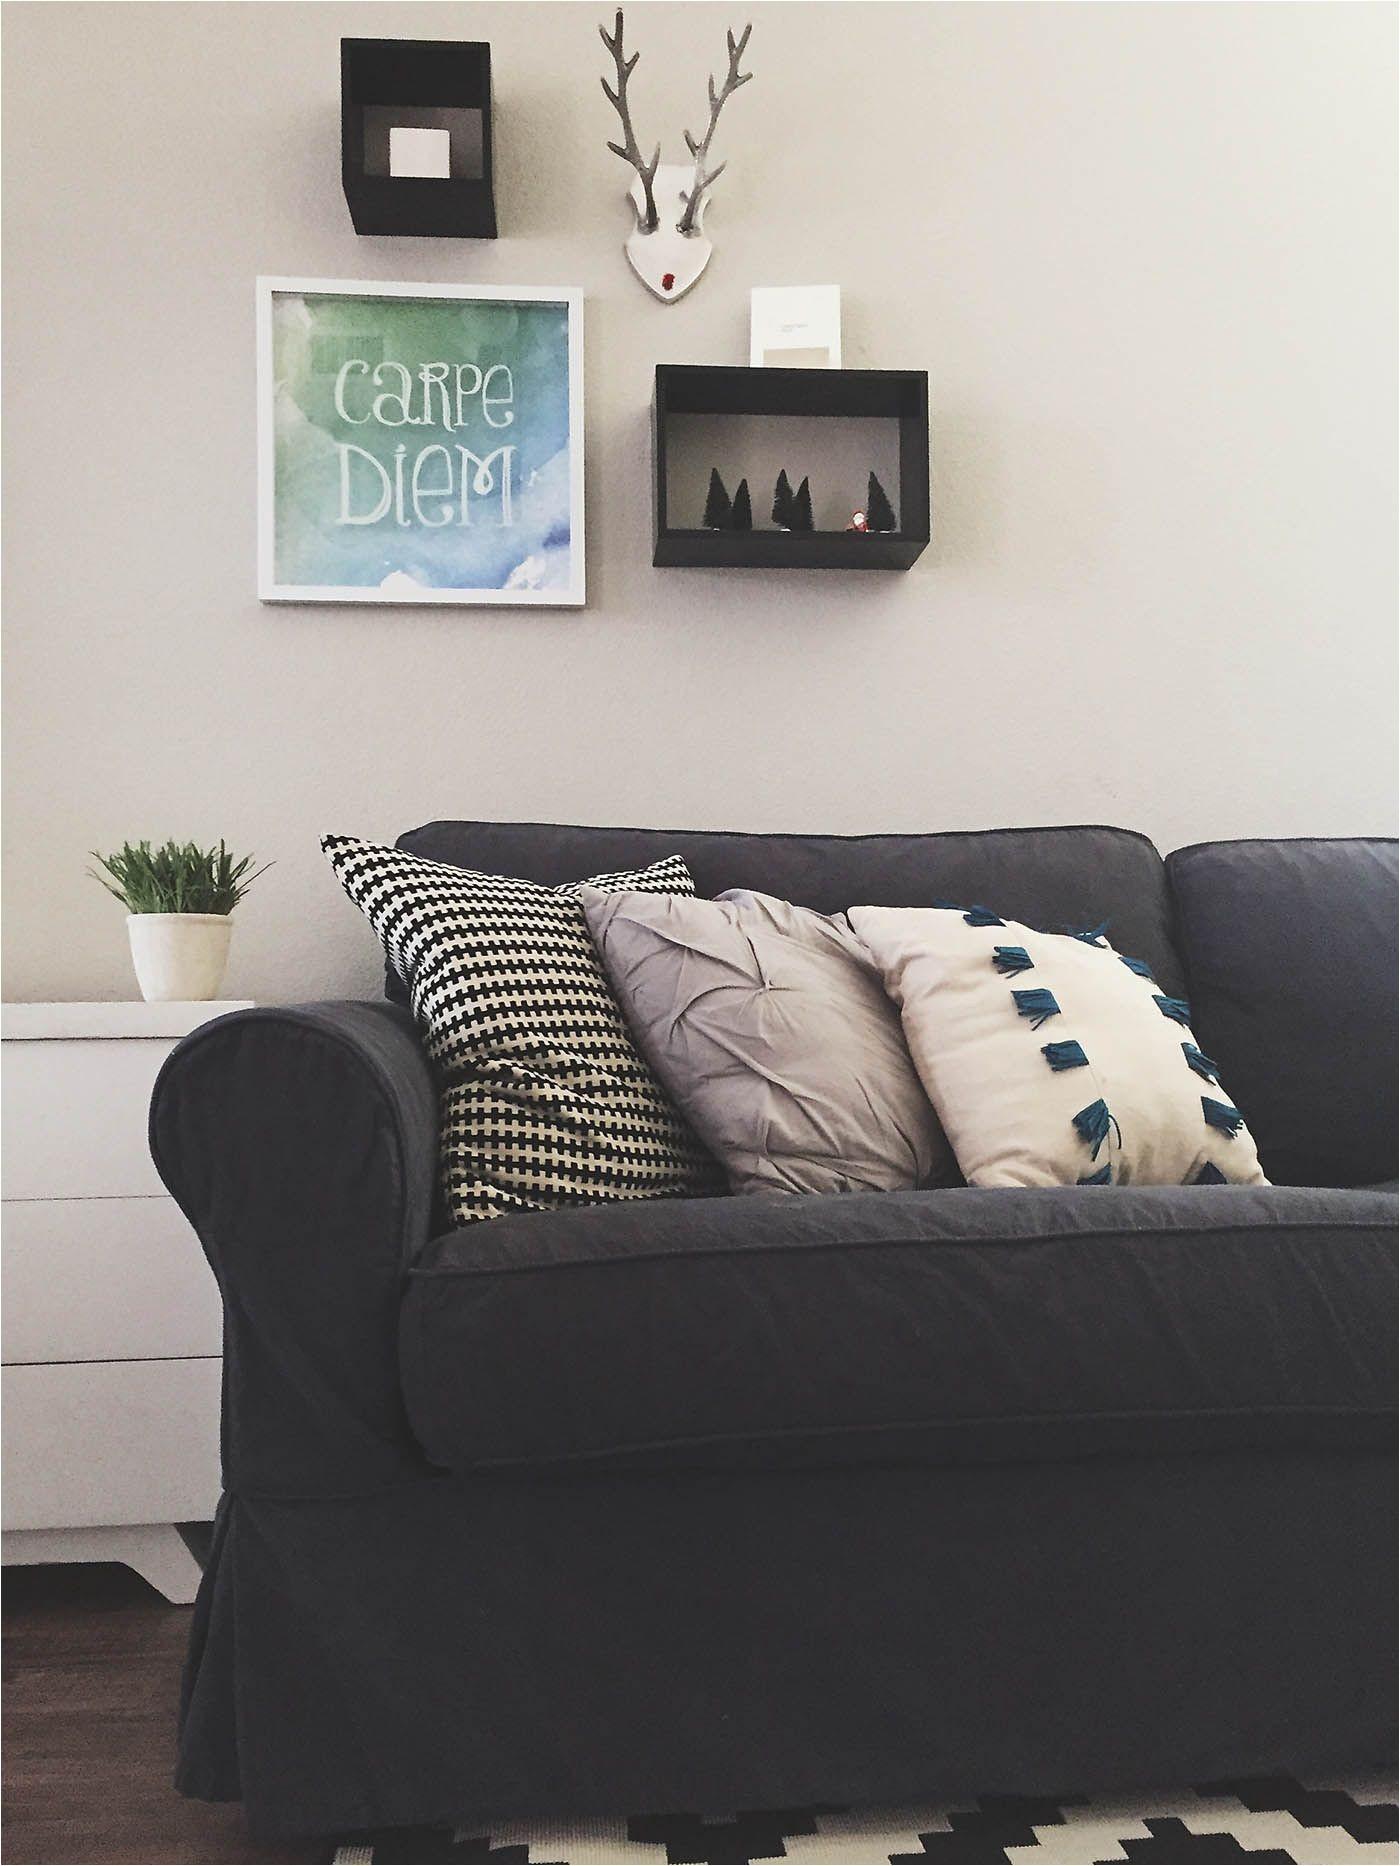 Ll Bean Sofa Slipcover How To Dye A Sofa Slipcover Diy Pinterest